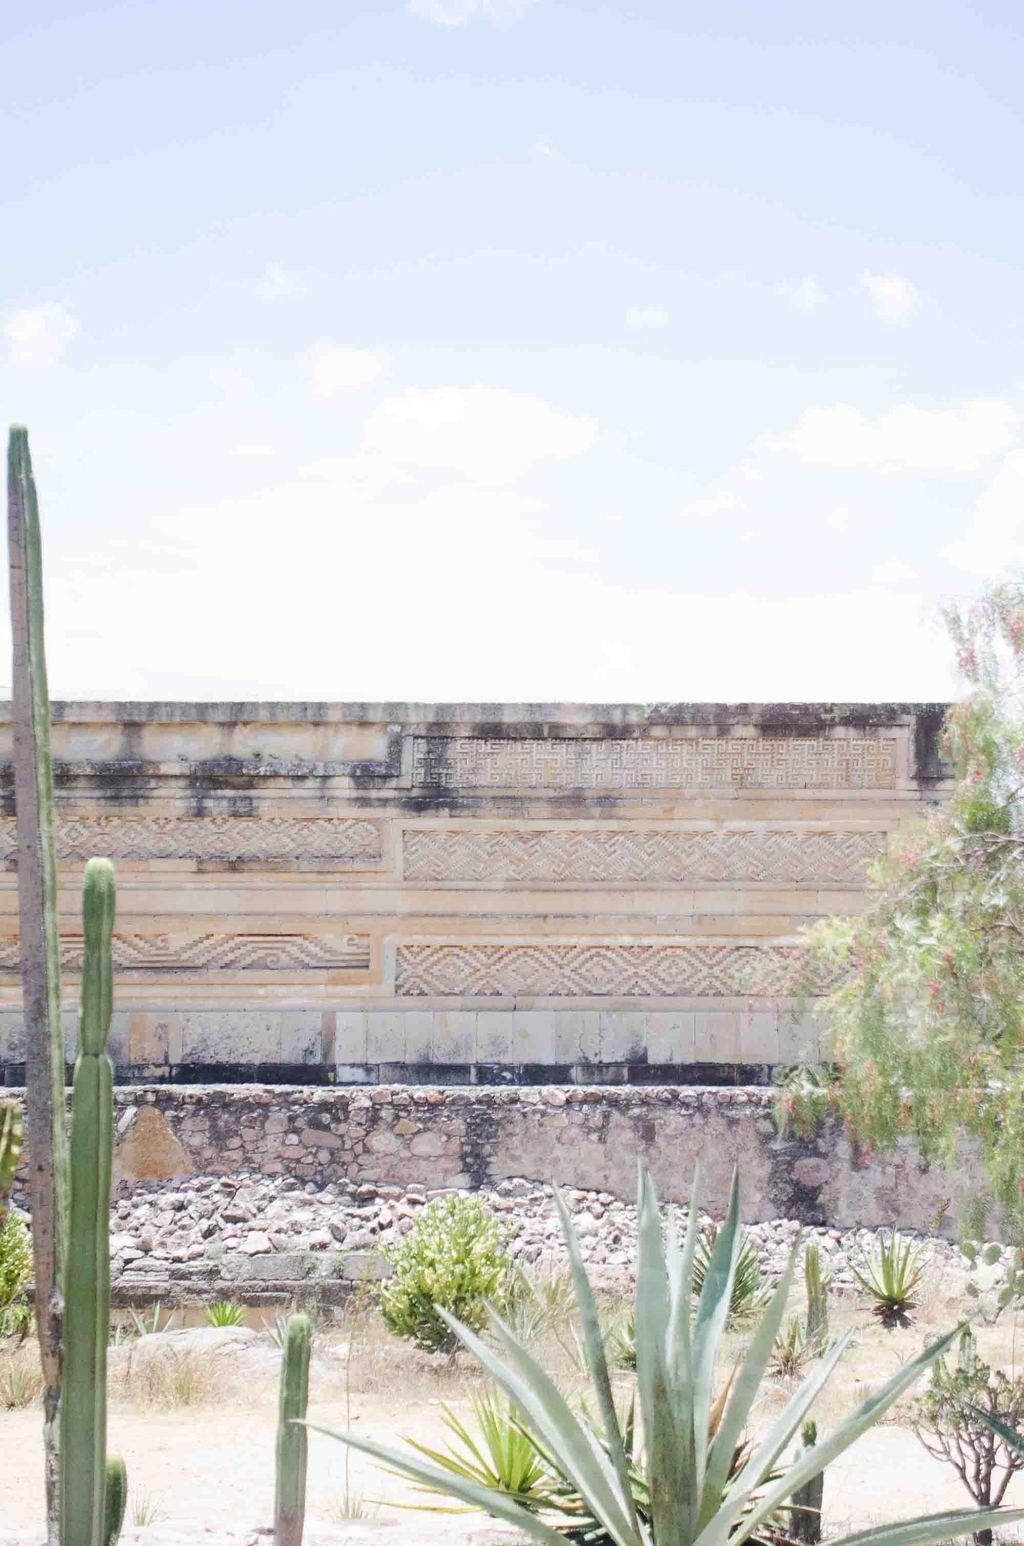 Mitla in Oaxaca, Mexico